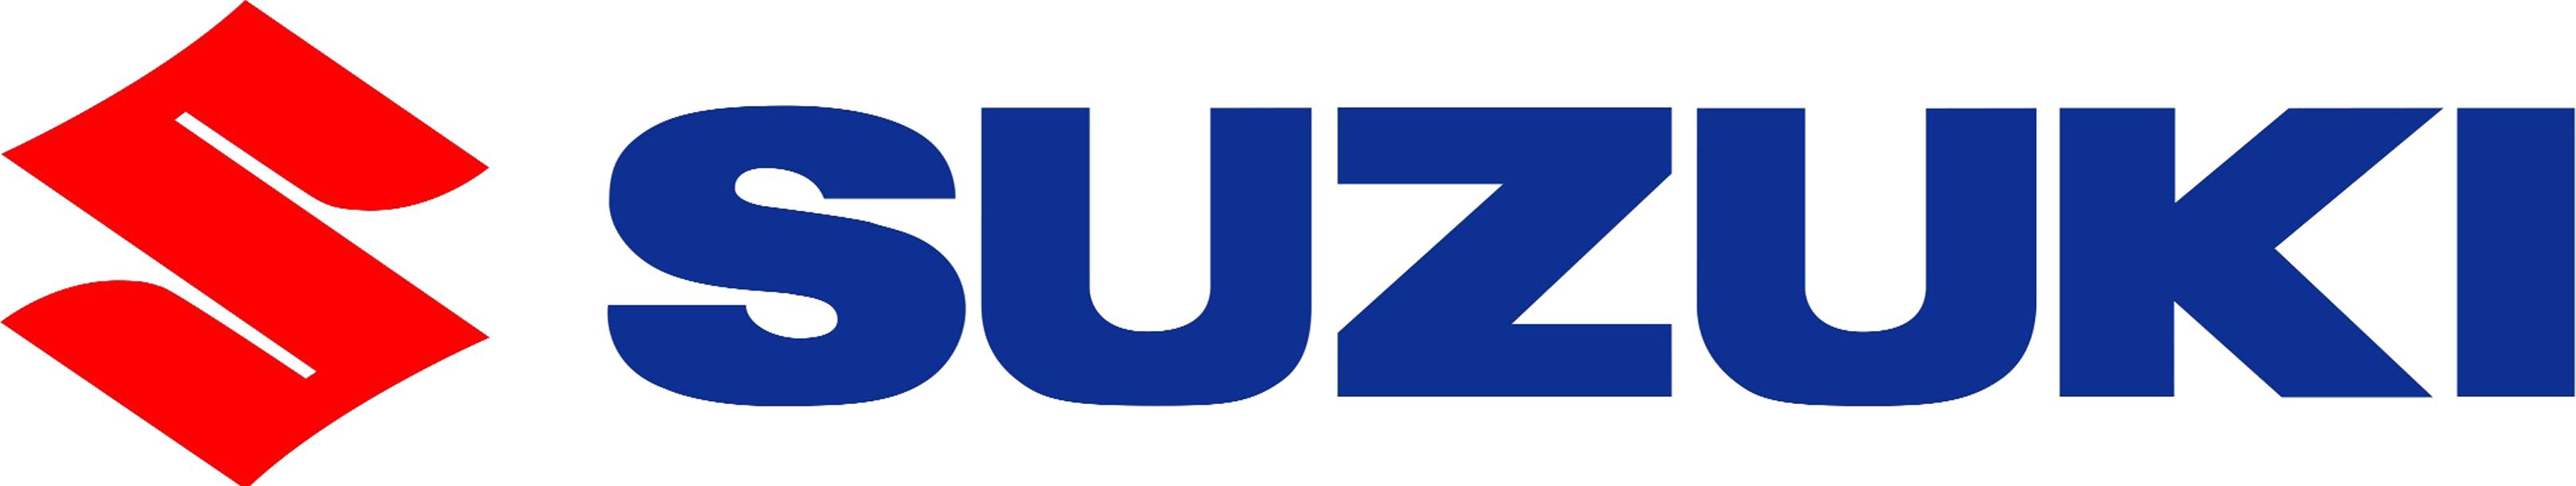 Suzuki Marine Moteurs